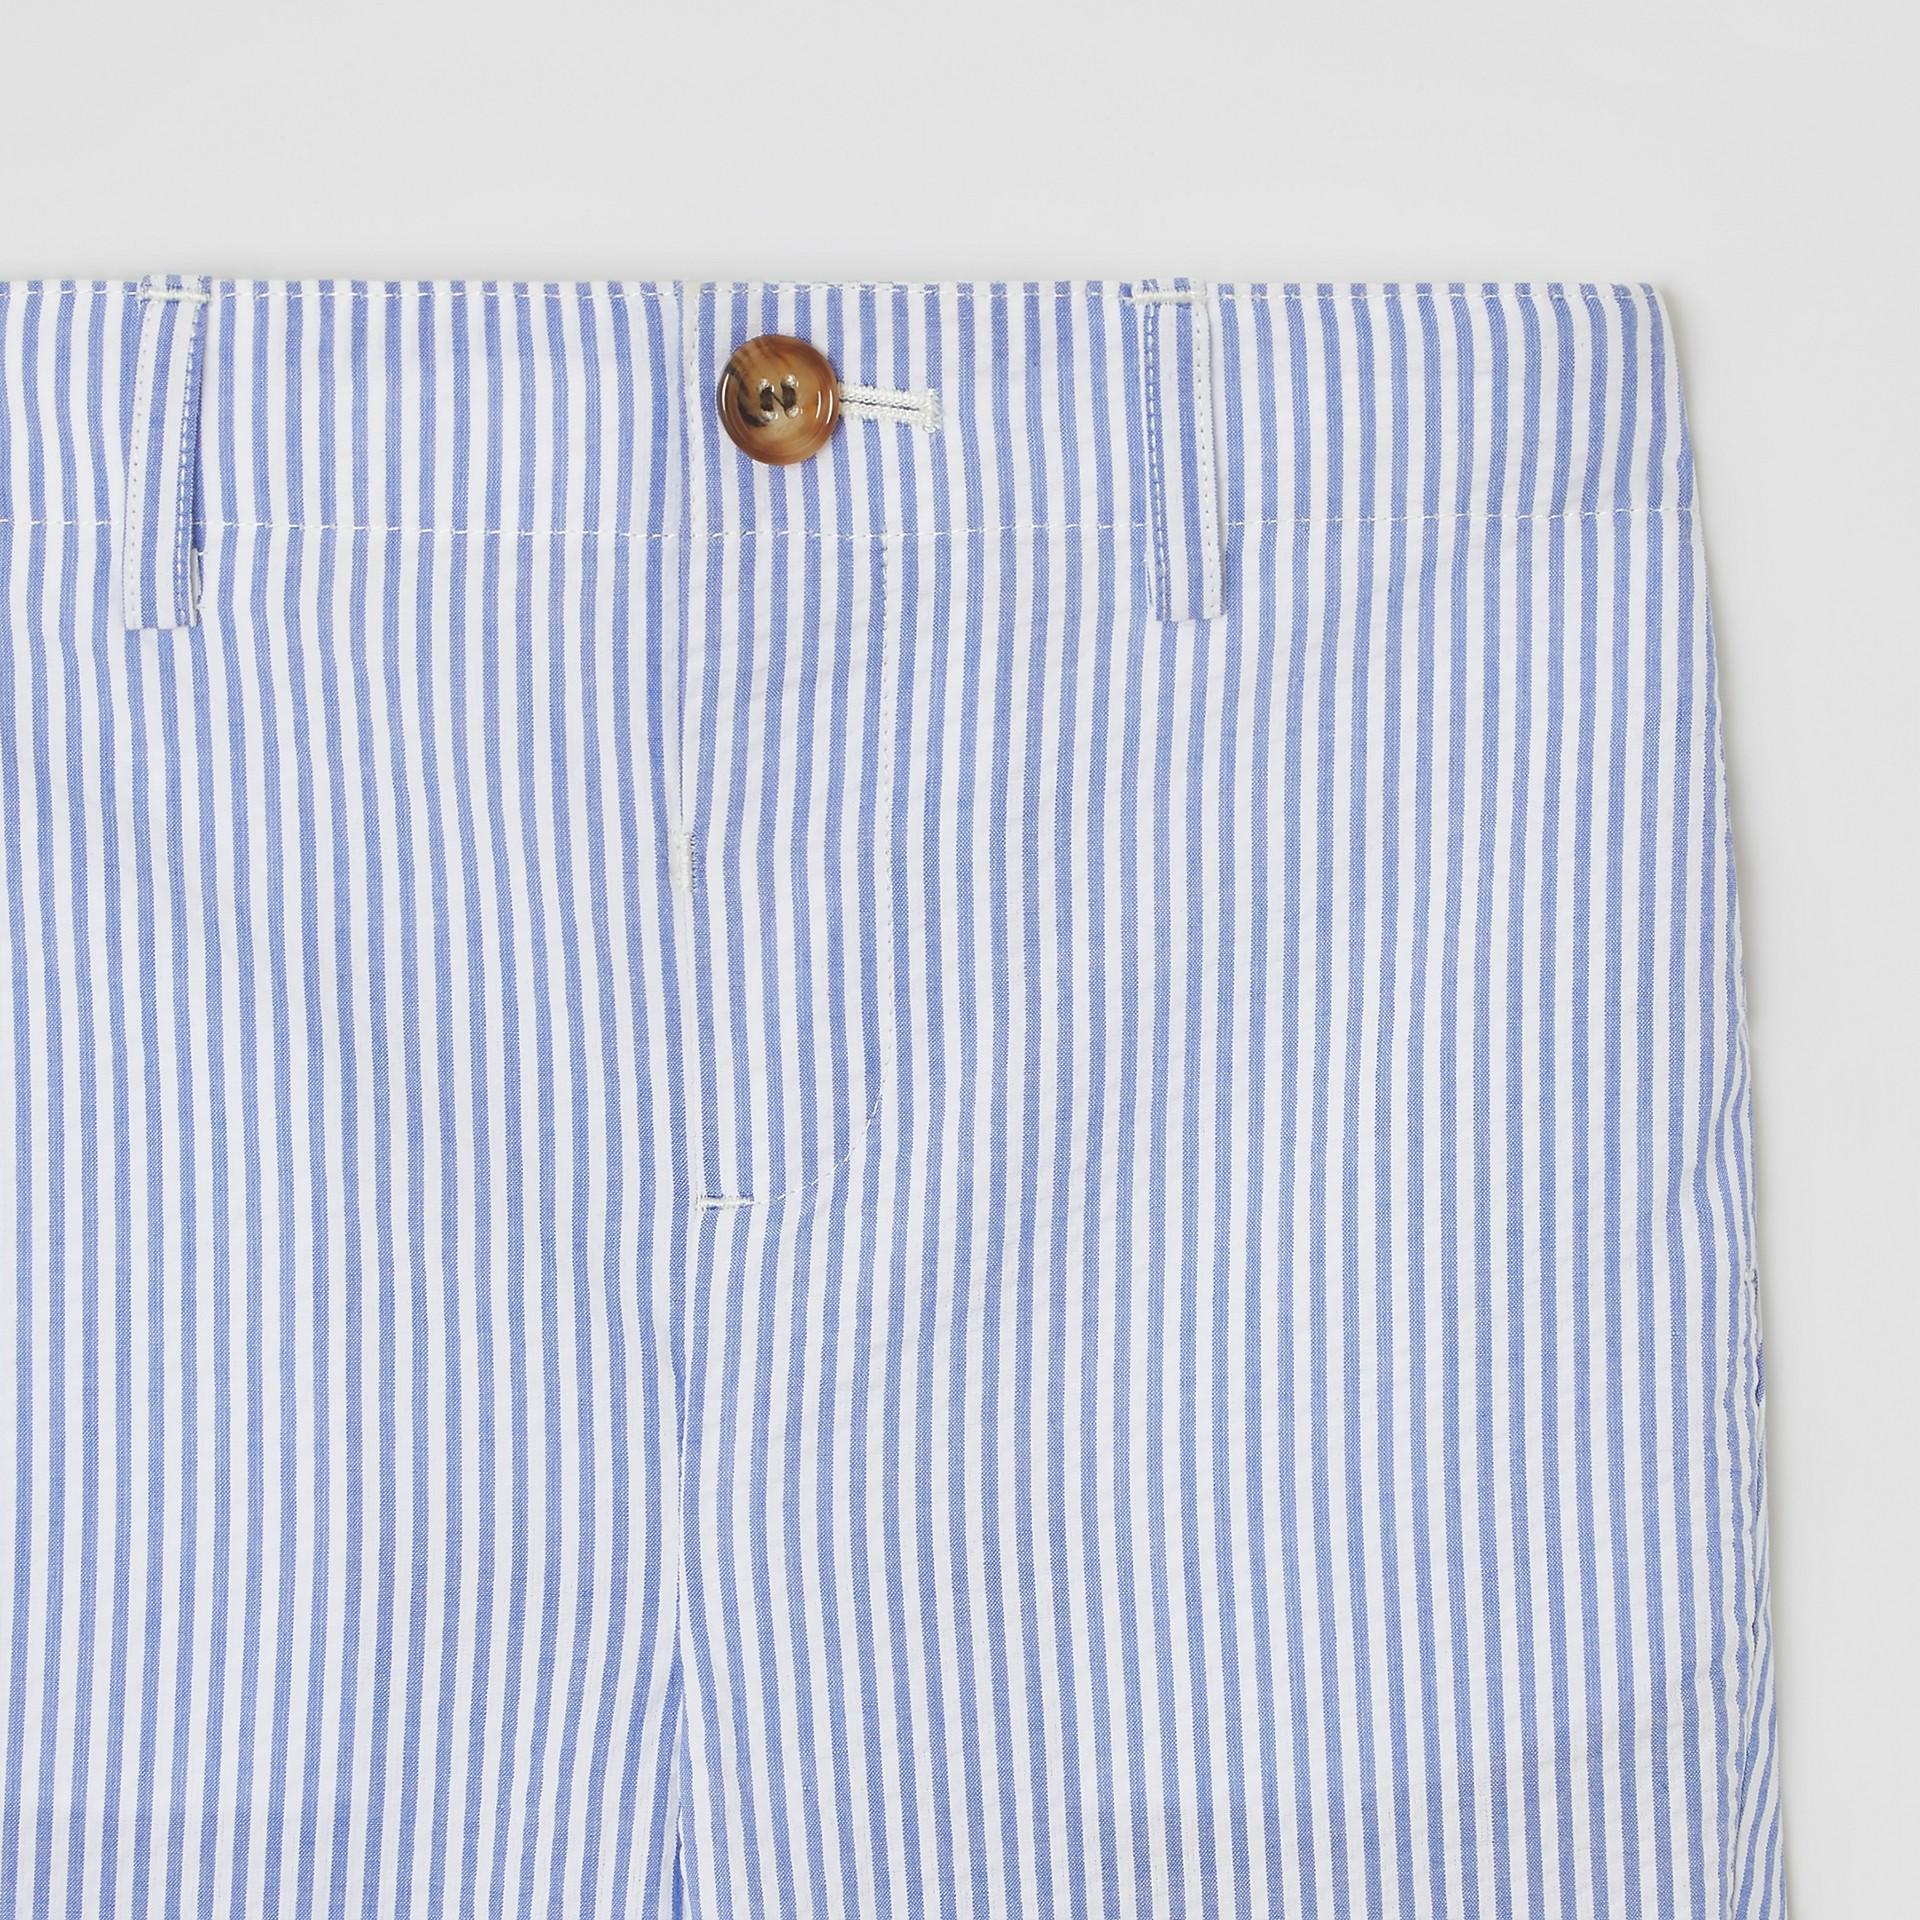 Striped Cotton Seersucker Tailored Trousers in Cornflower Blue - Children | Burberry - gallery image 4